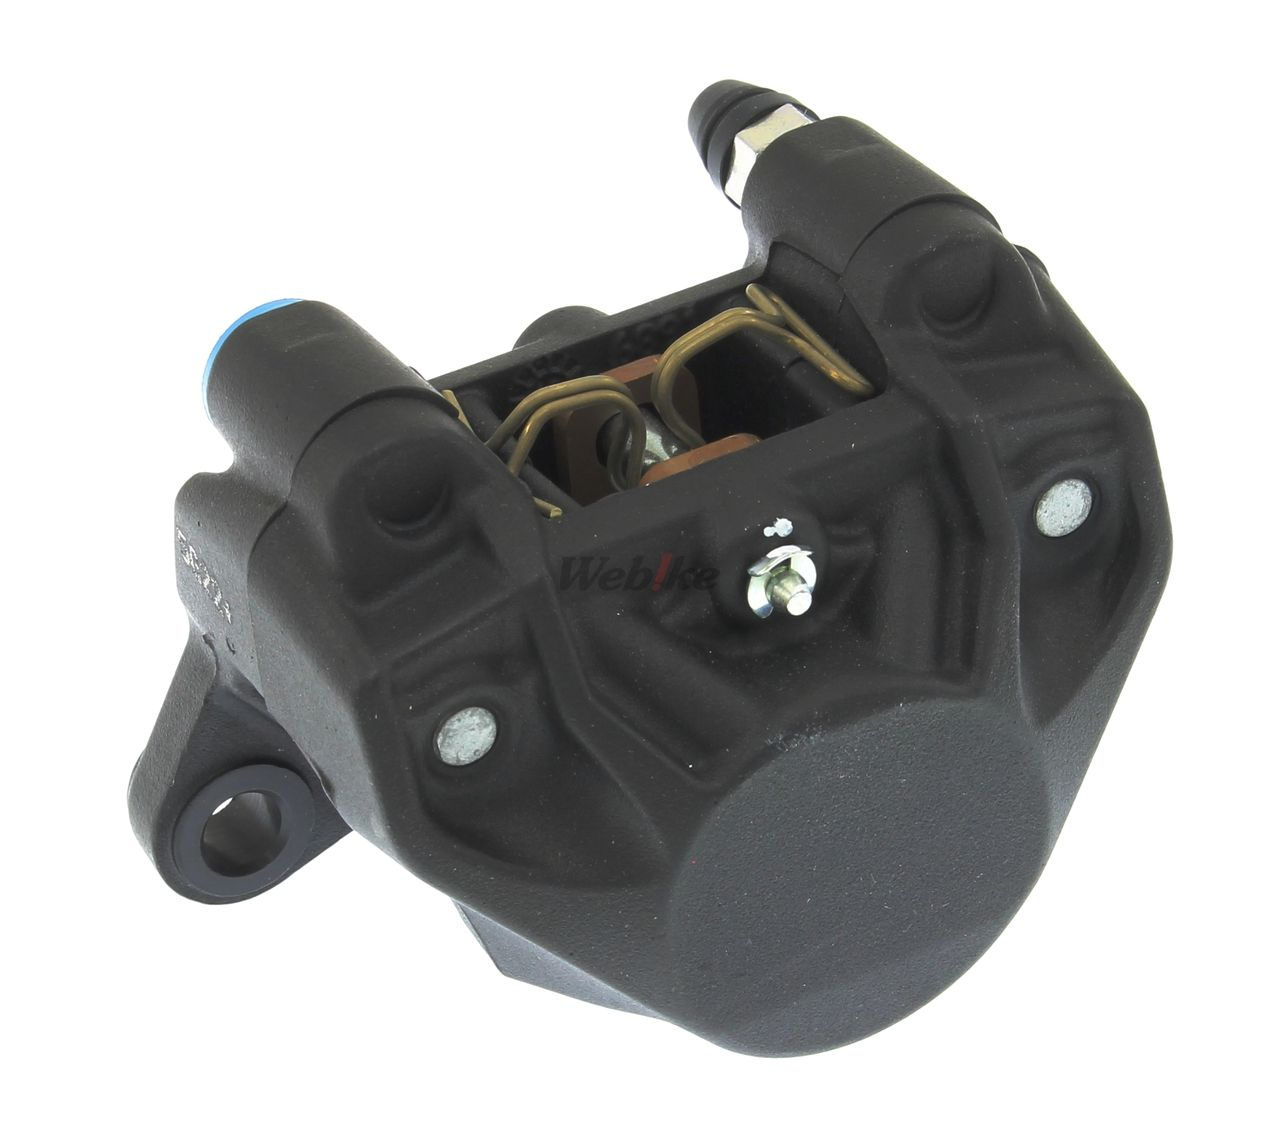 【brembo】後卡鉗 P2 34 84mm 黑色 新螃蟹卡鉗 - 「Webike-摩托百貨」